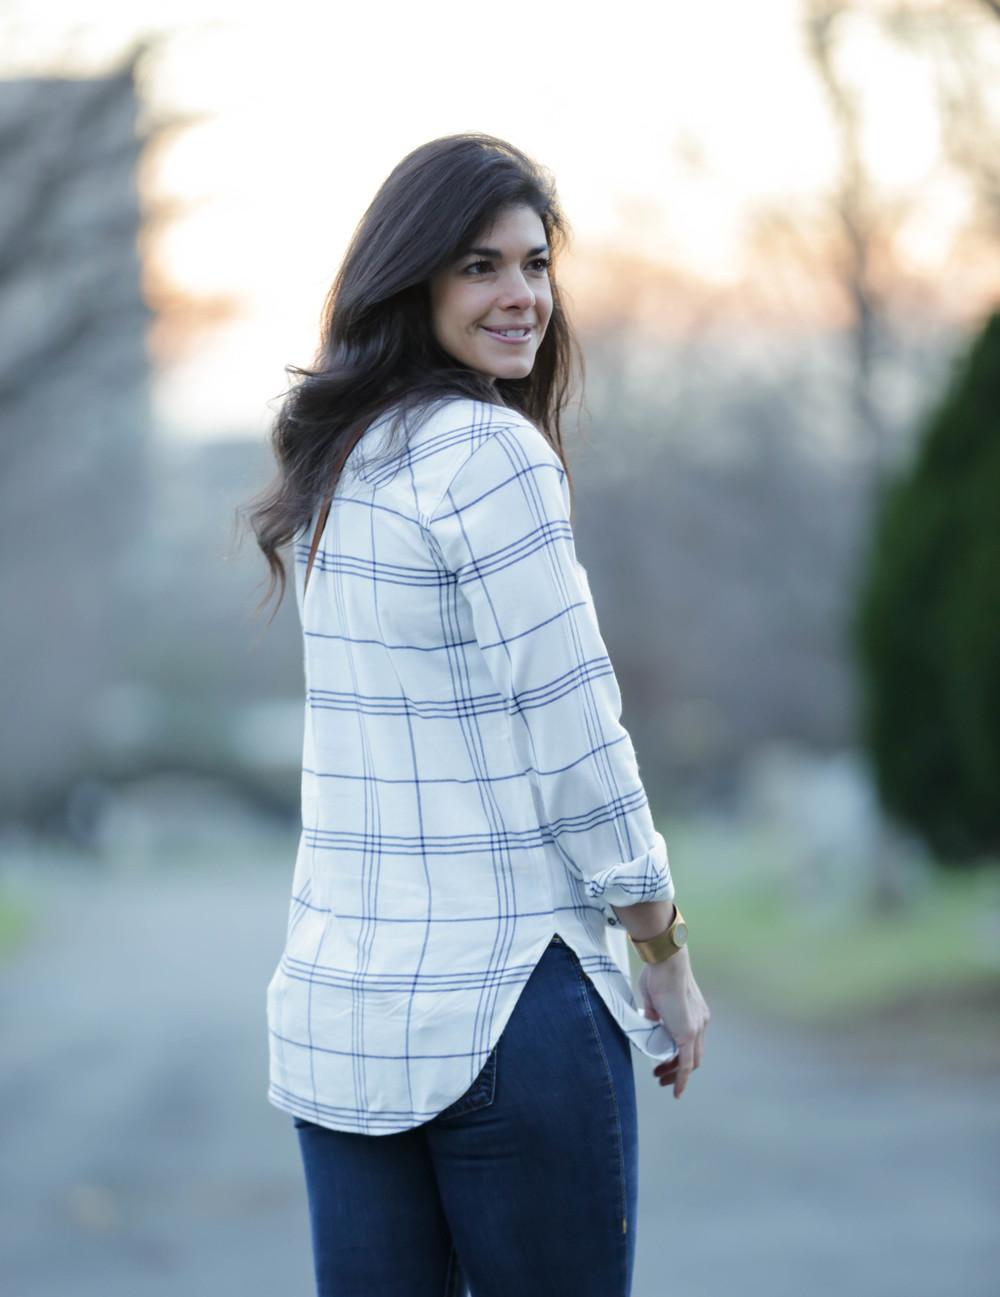 LaurenSchwaiger-Life-Style-Blog-Athleta-Lumberjill-Flannel.jpg